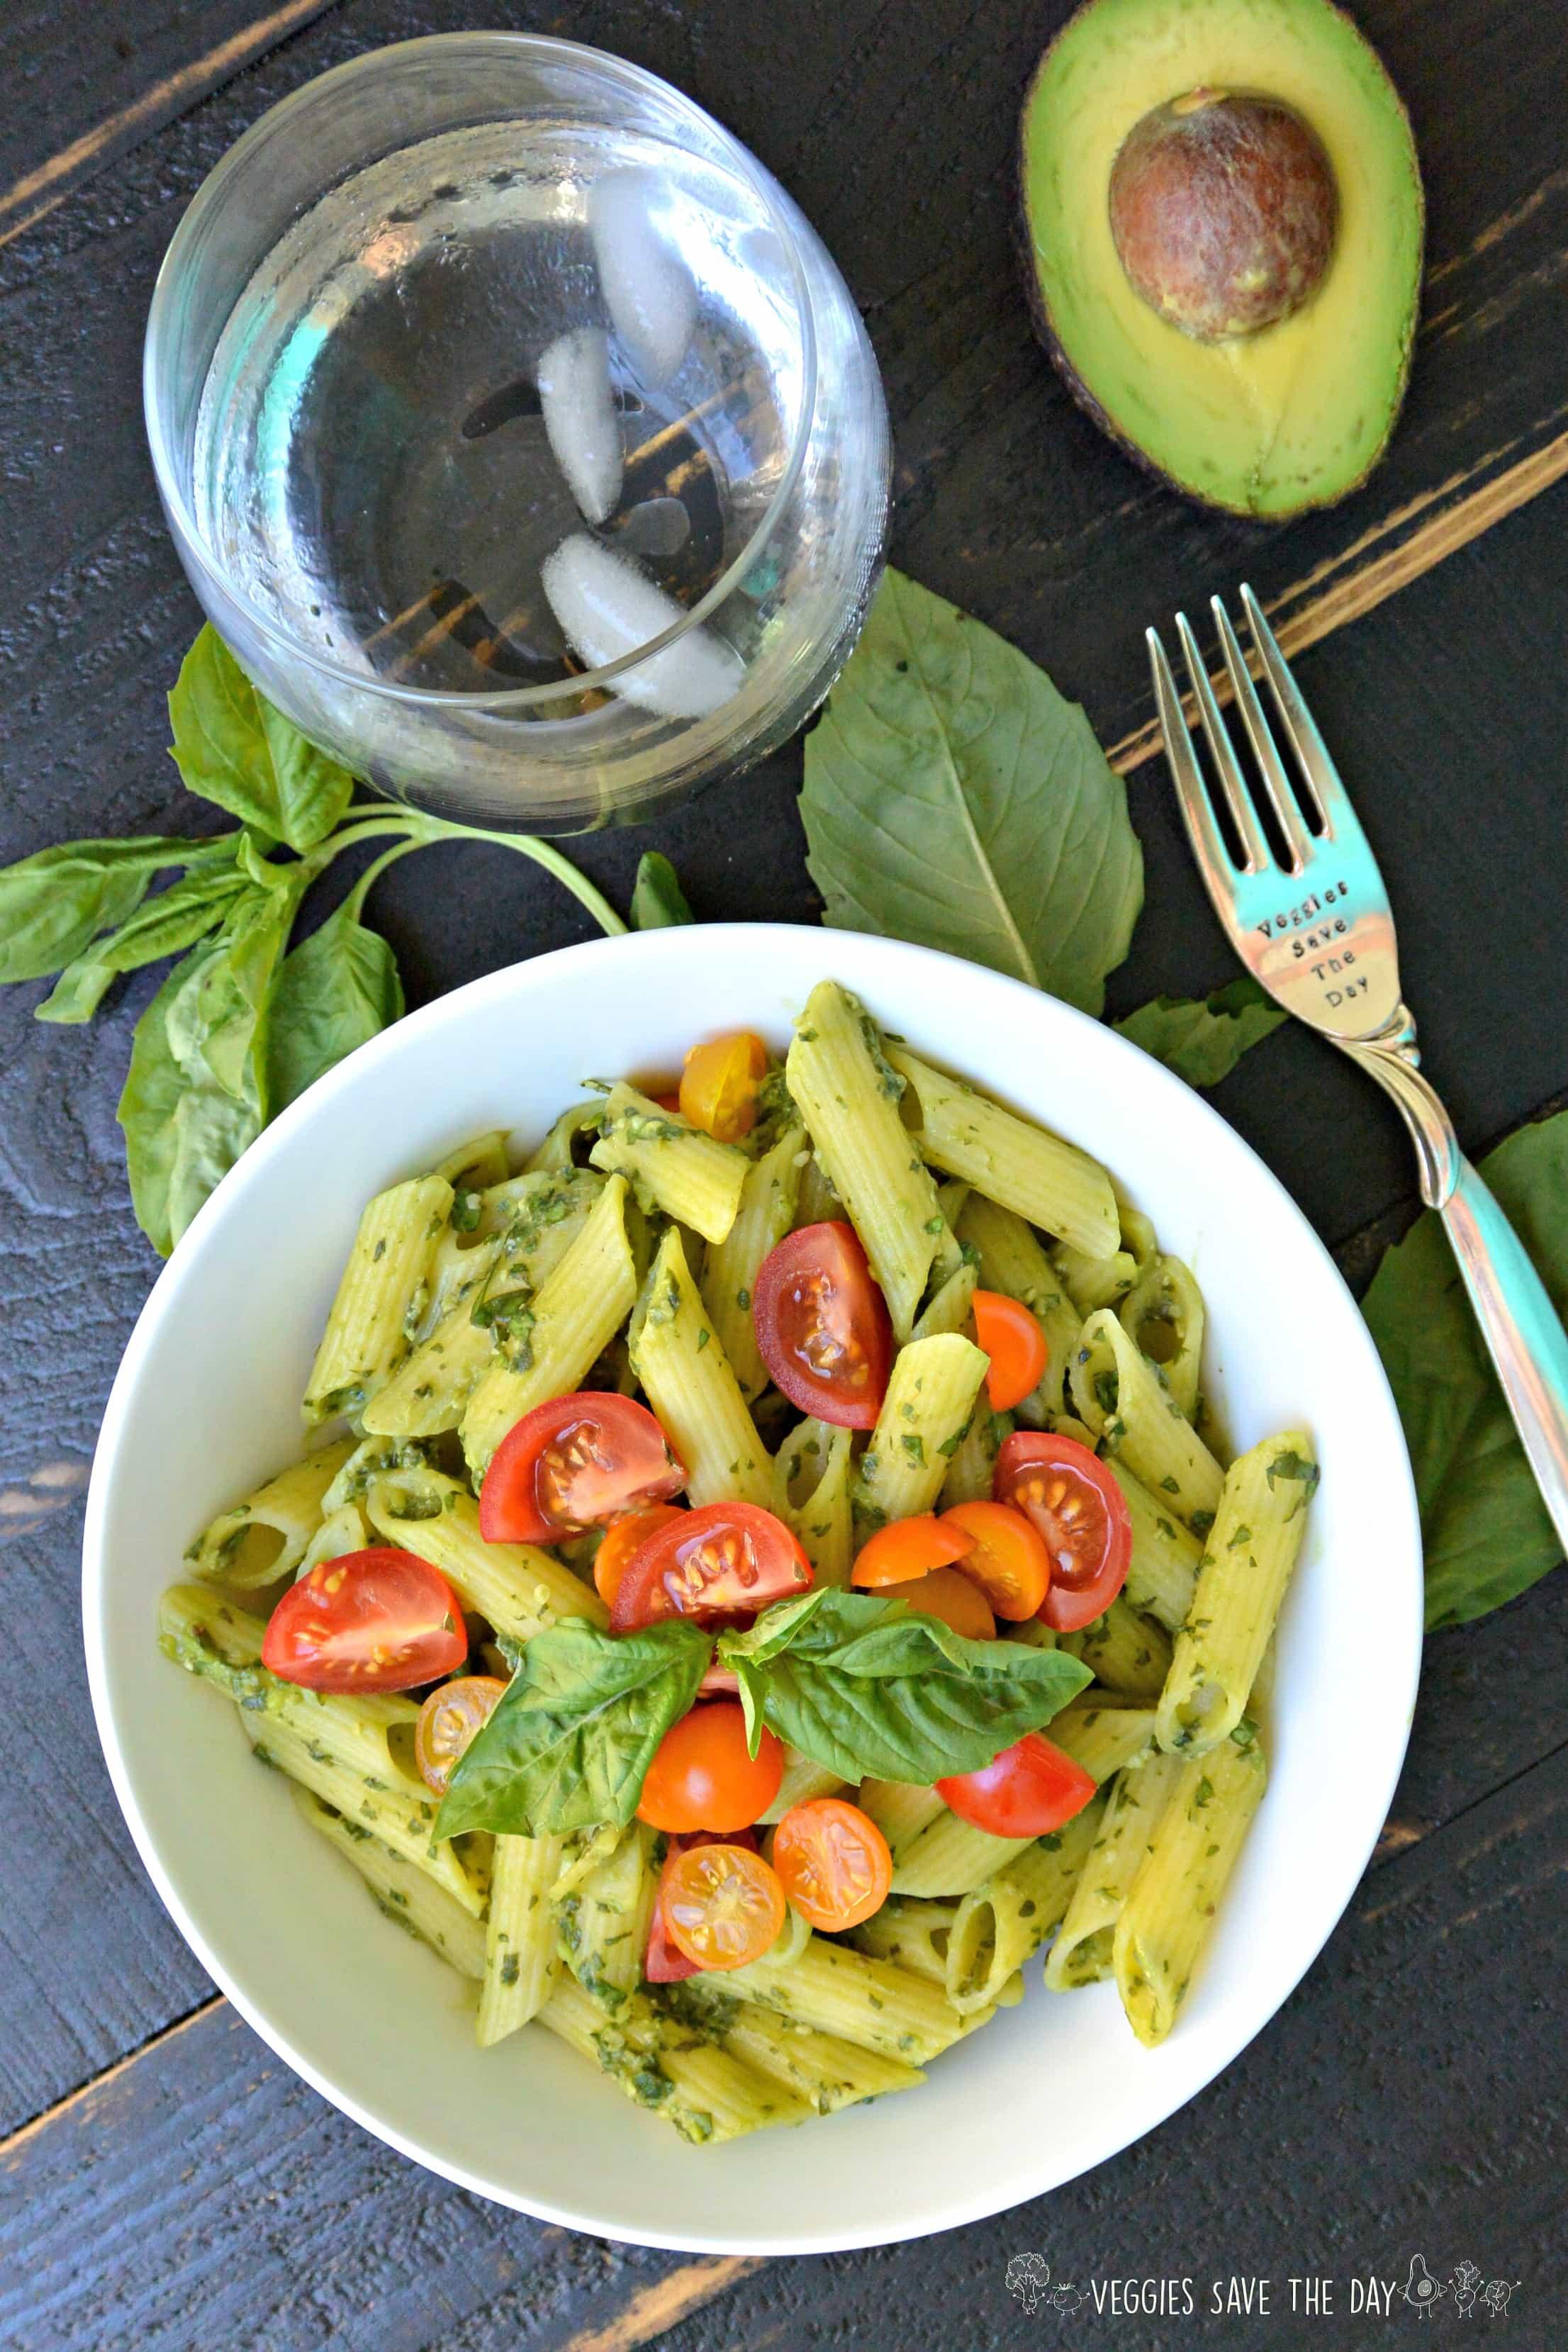 Gluten-Free Vegan Recipes- avocado basil peso pasta